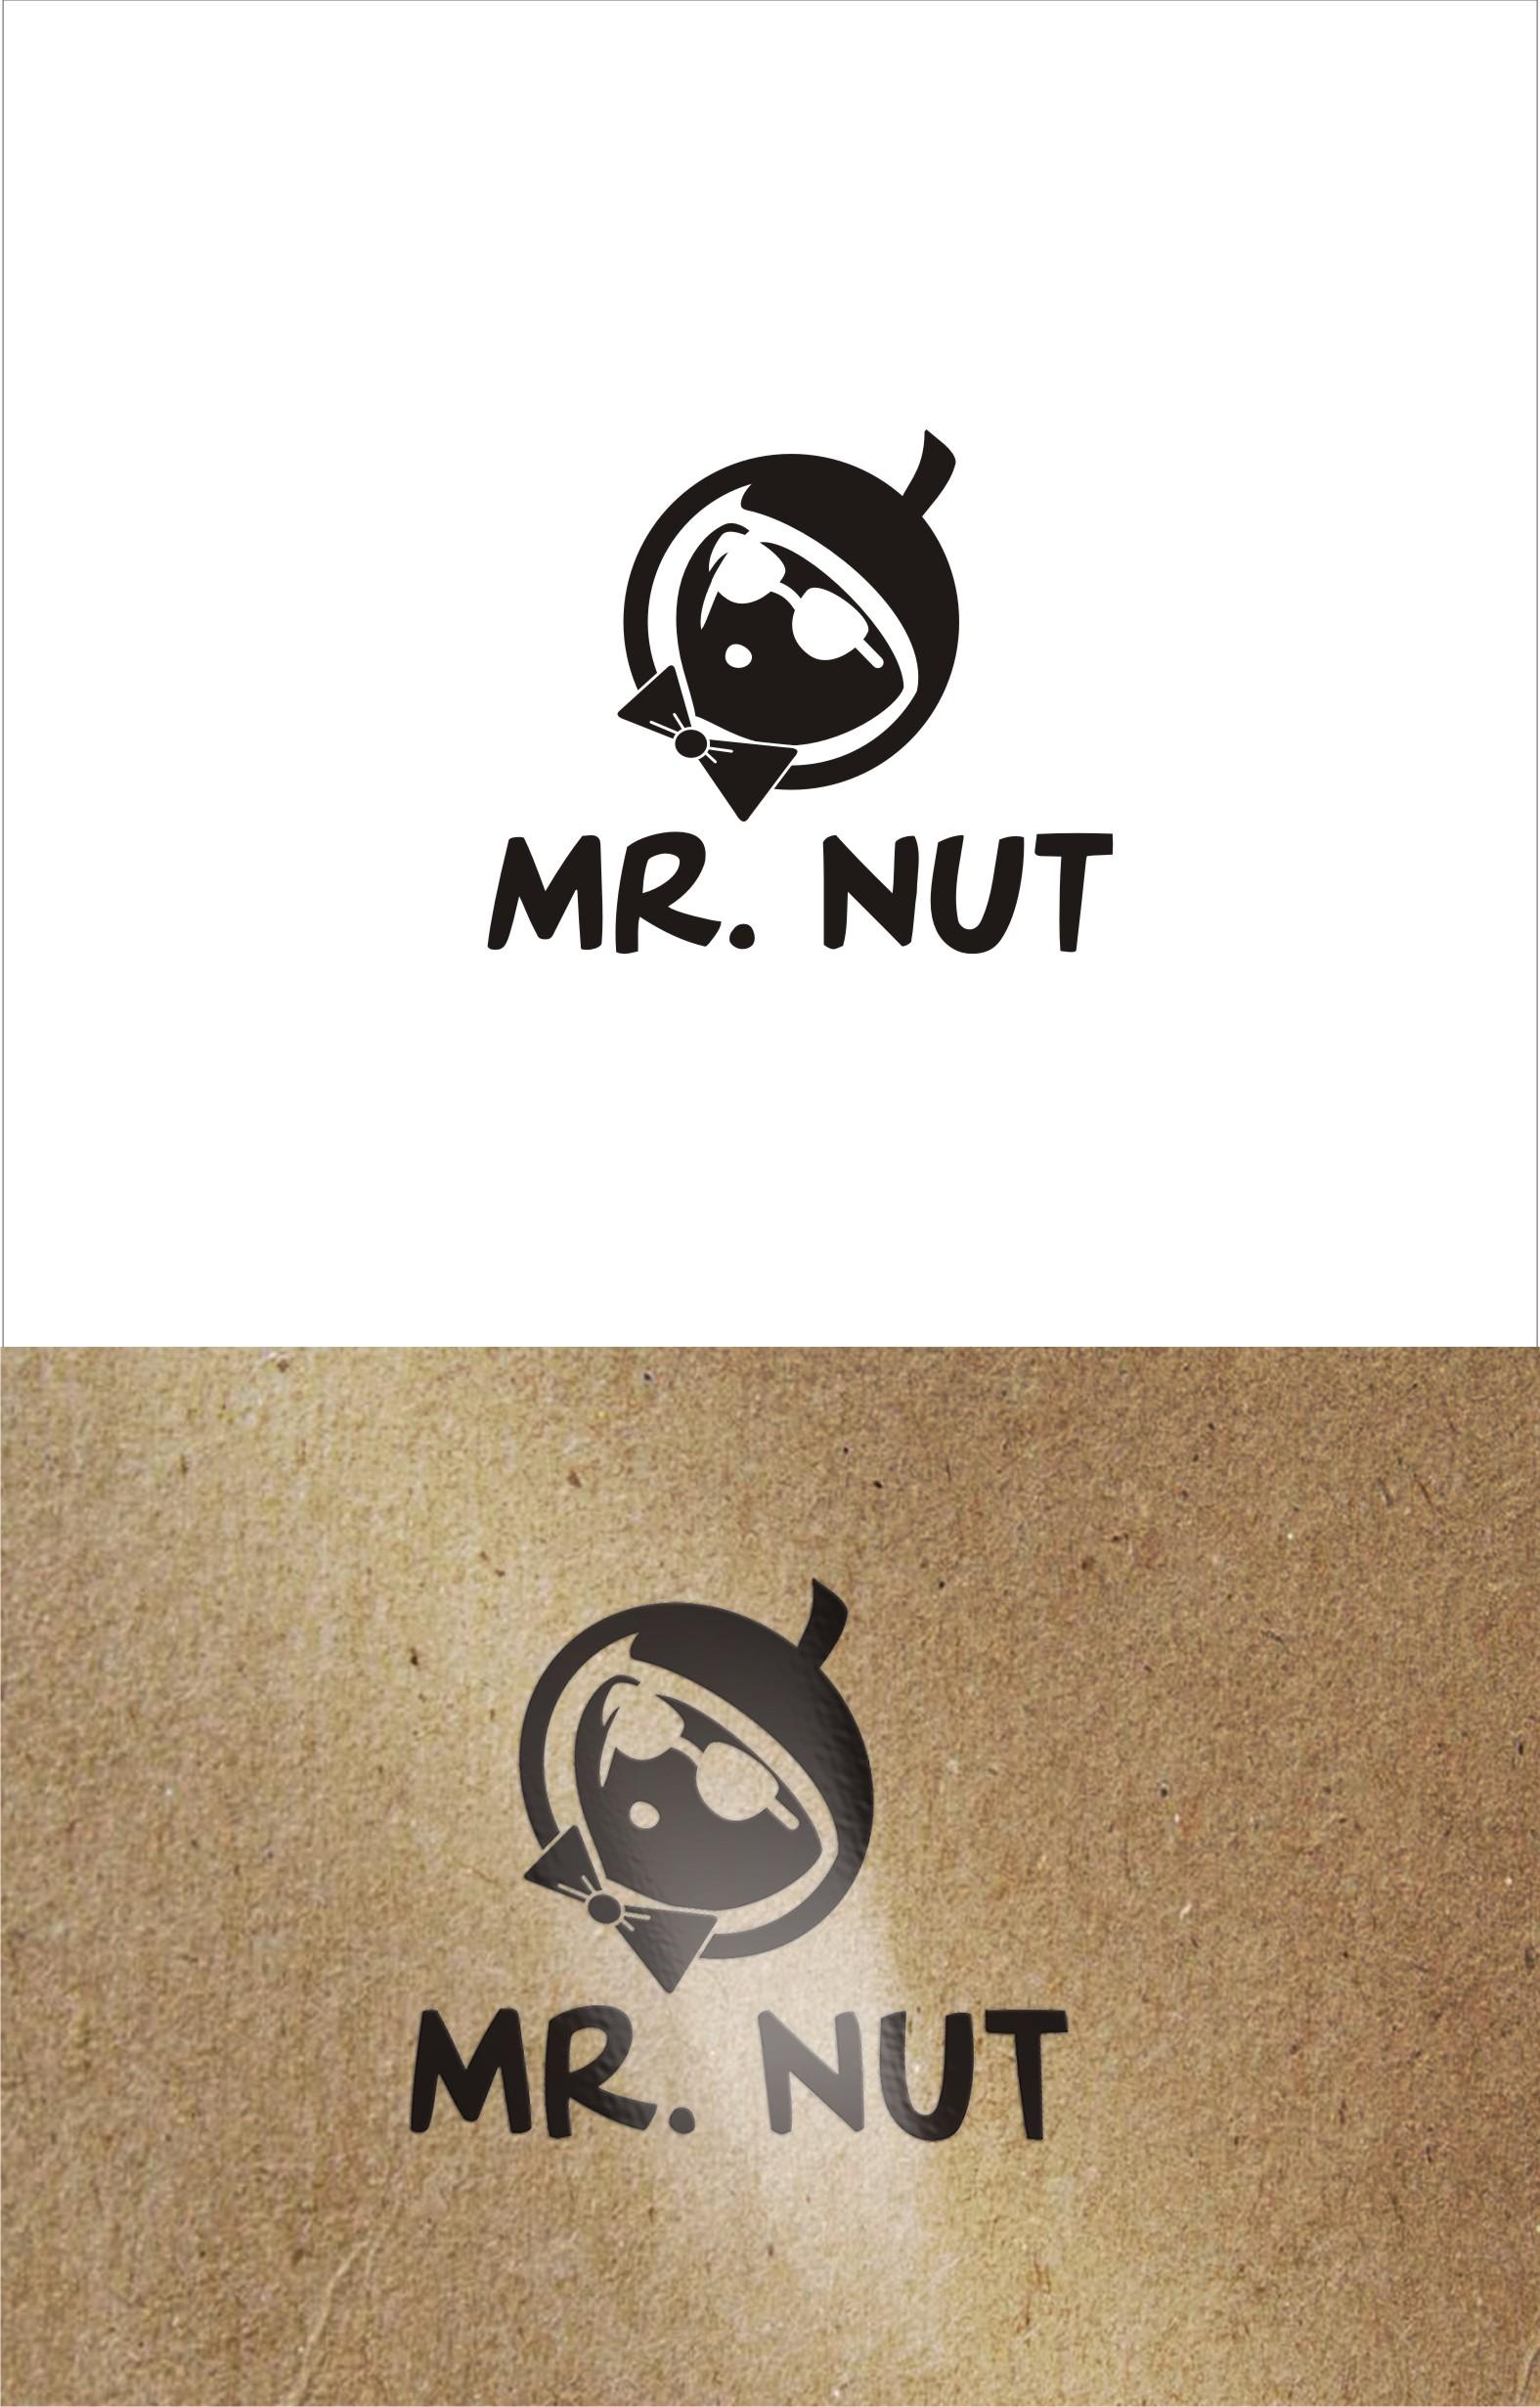 Разработать логотип и визитку фото f_37658f4ba656c781.jpg